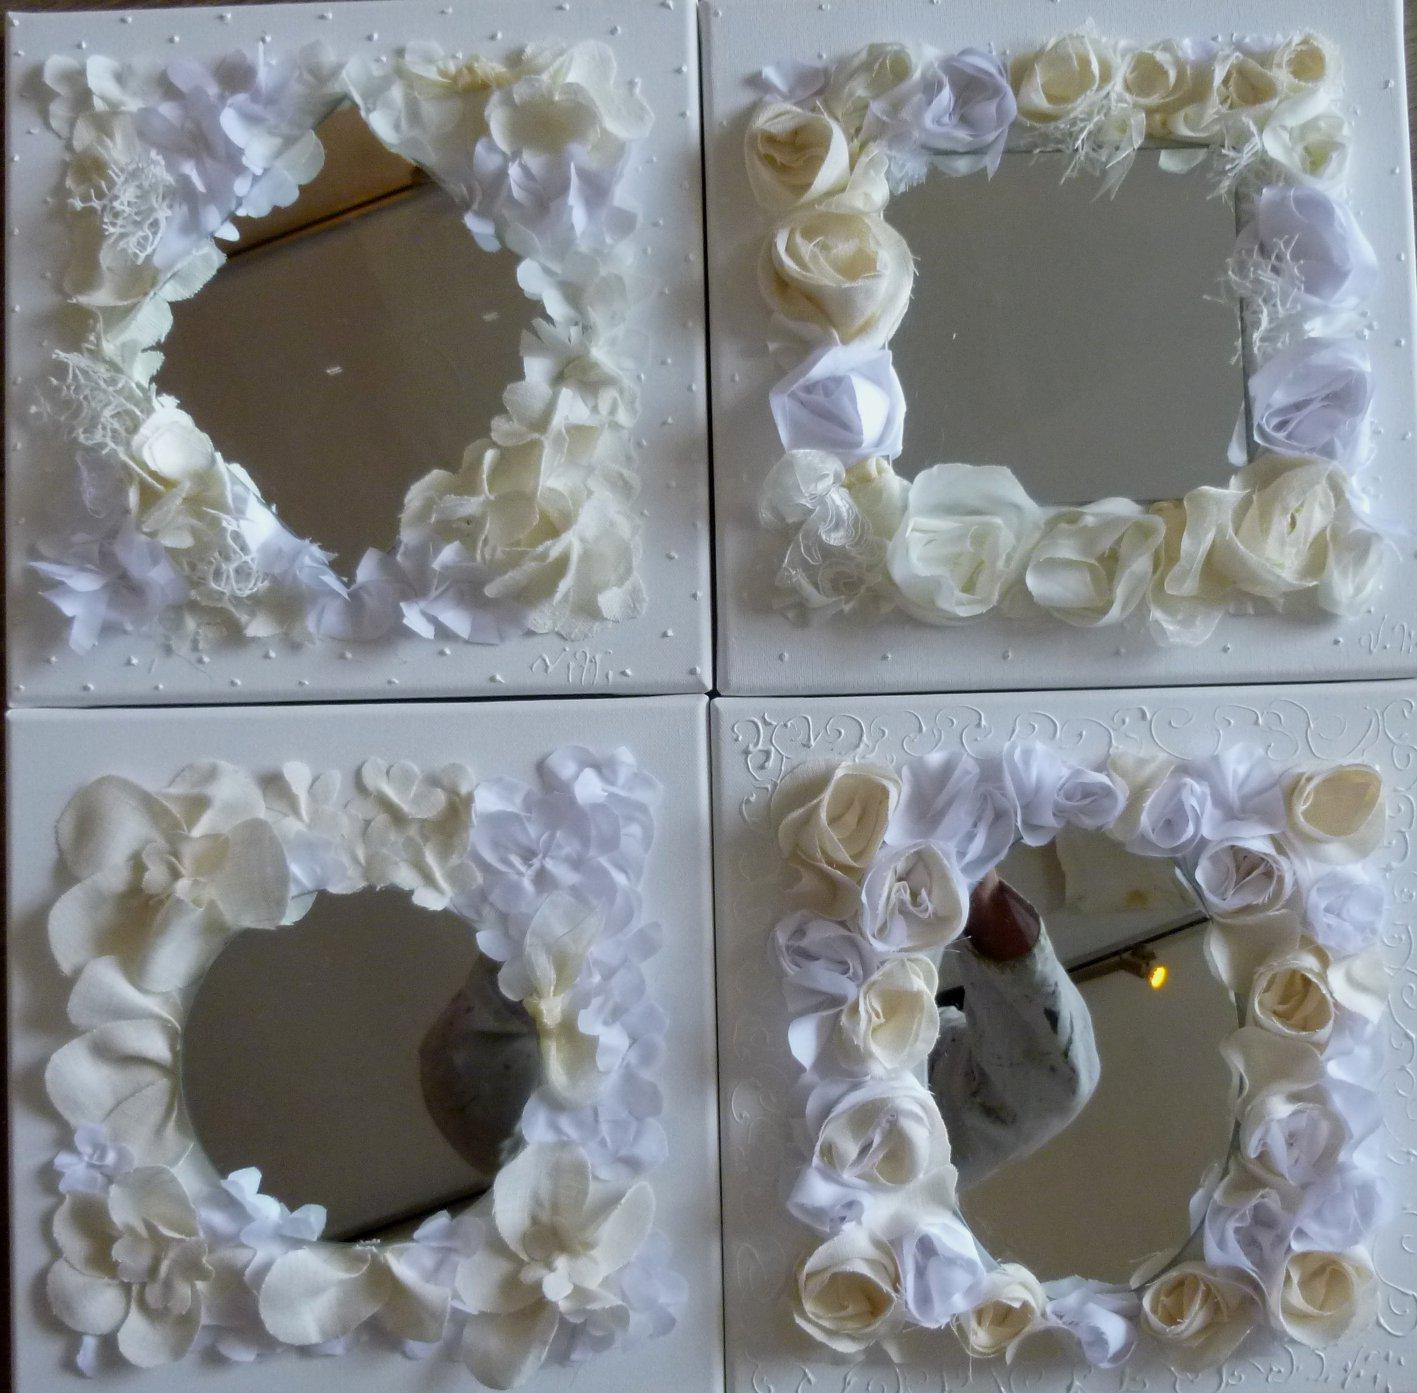 Miroirs de mariage 4x30x30